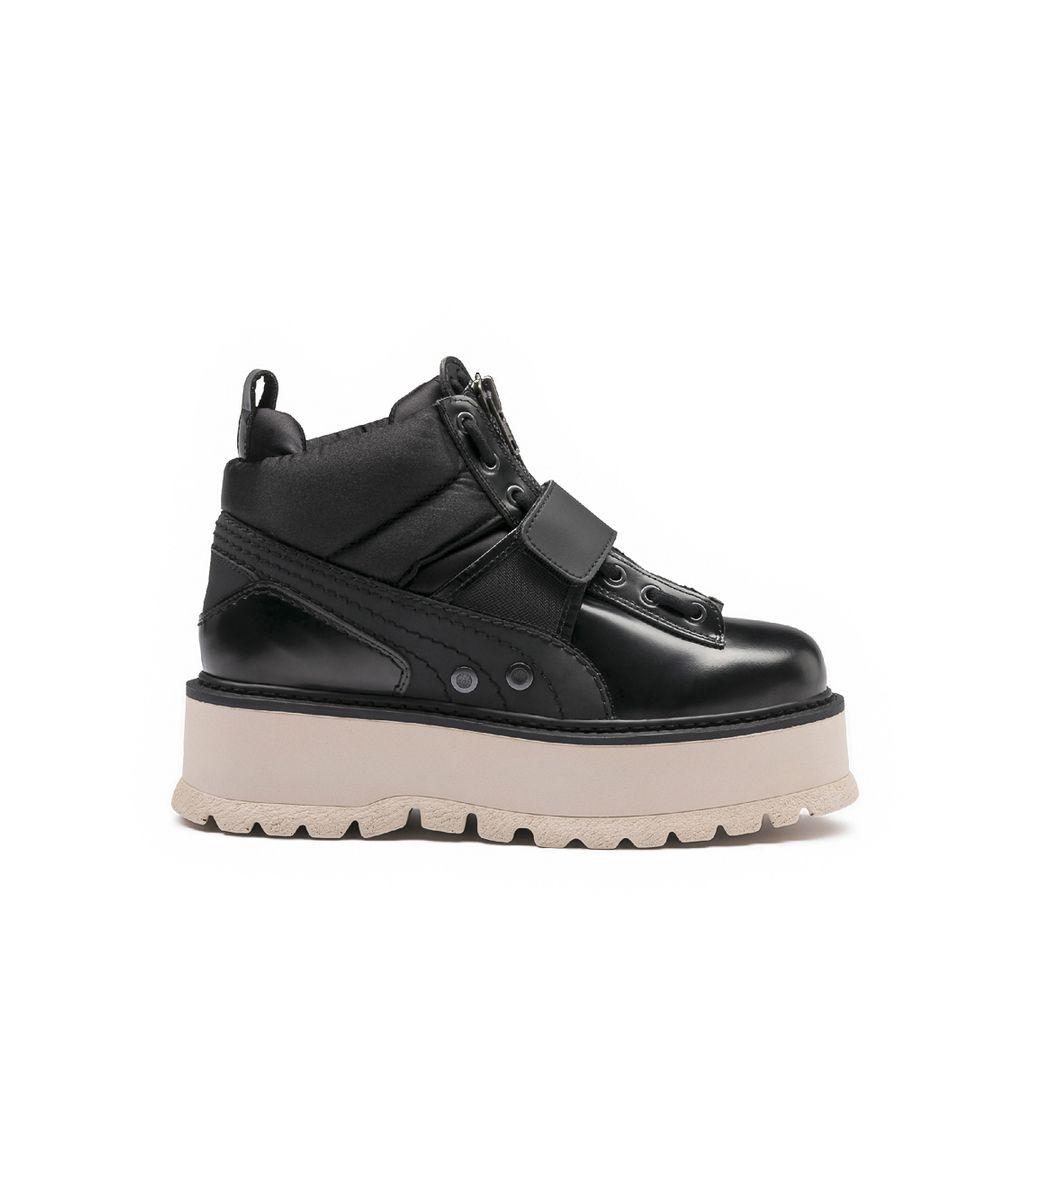 Sneaker boots, Puma boots